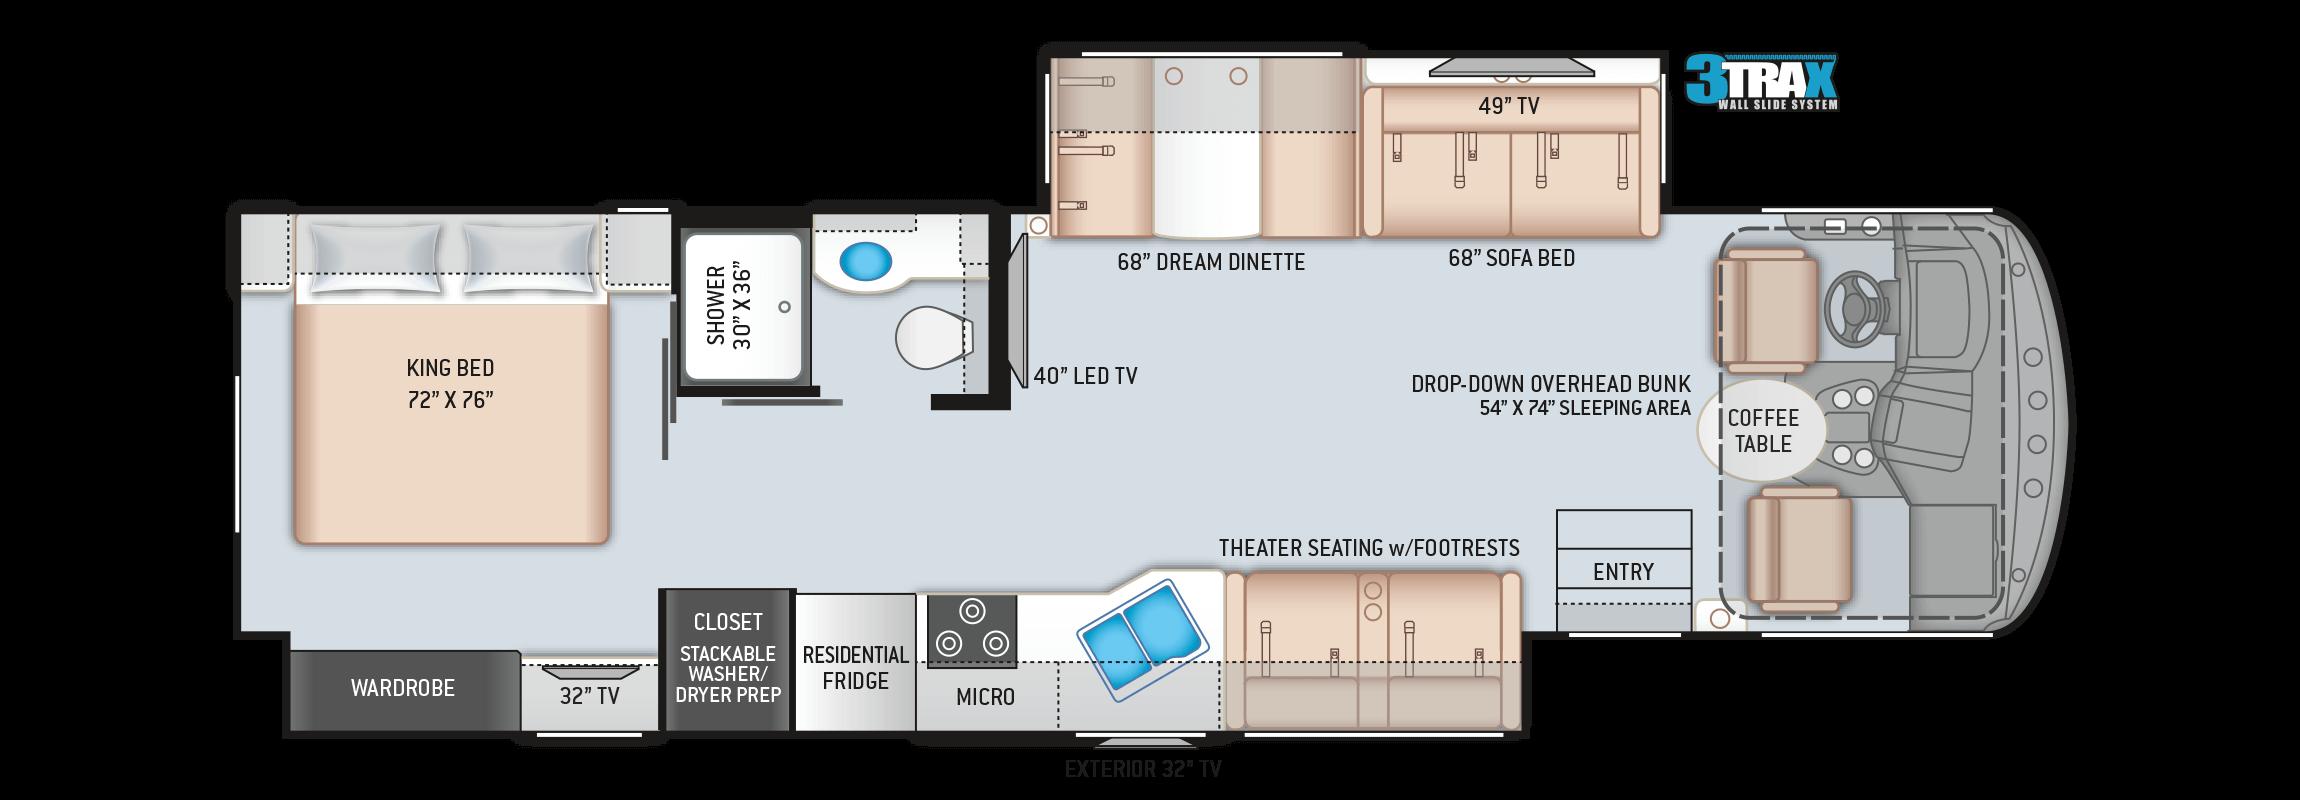 Hurricane 34R Floor Plan